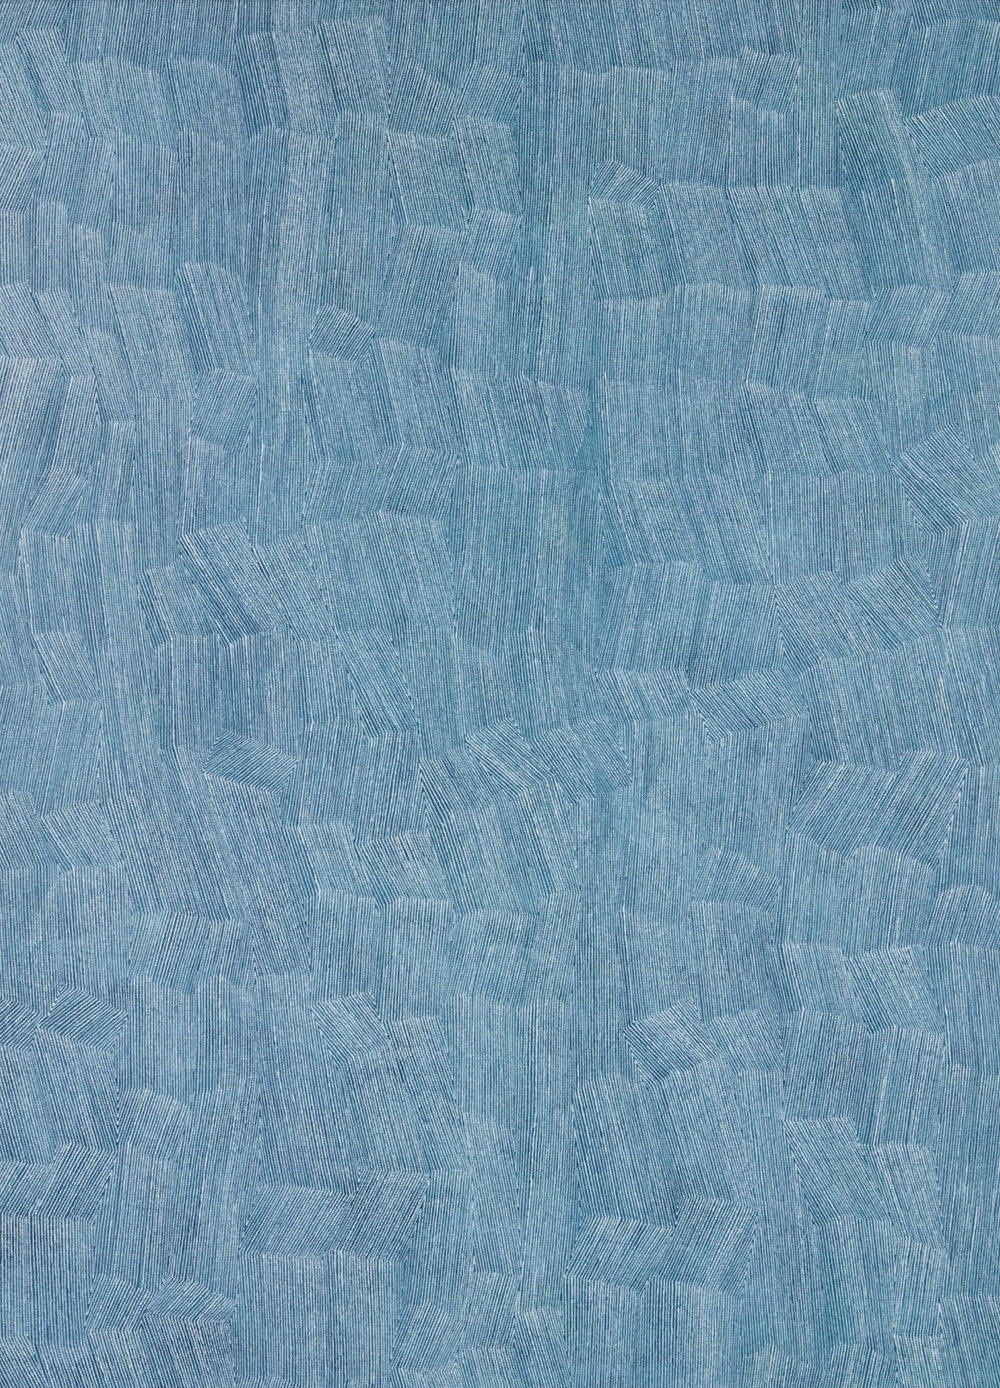 KARL WIEBKE  56-18 white on blues , 2018 acrylic on linen 83 x 60 cm